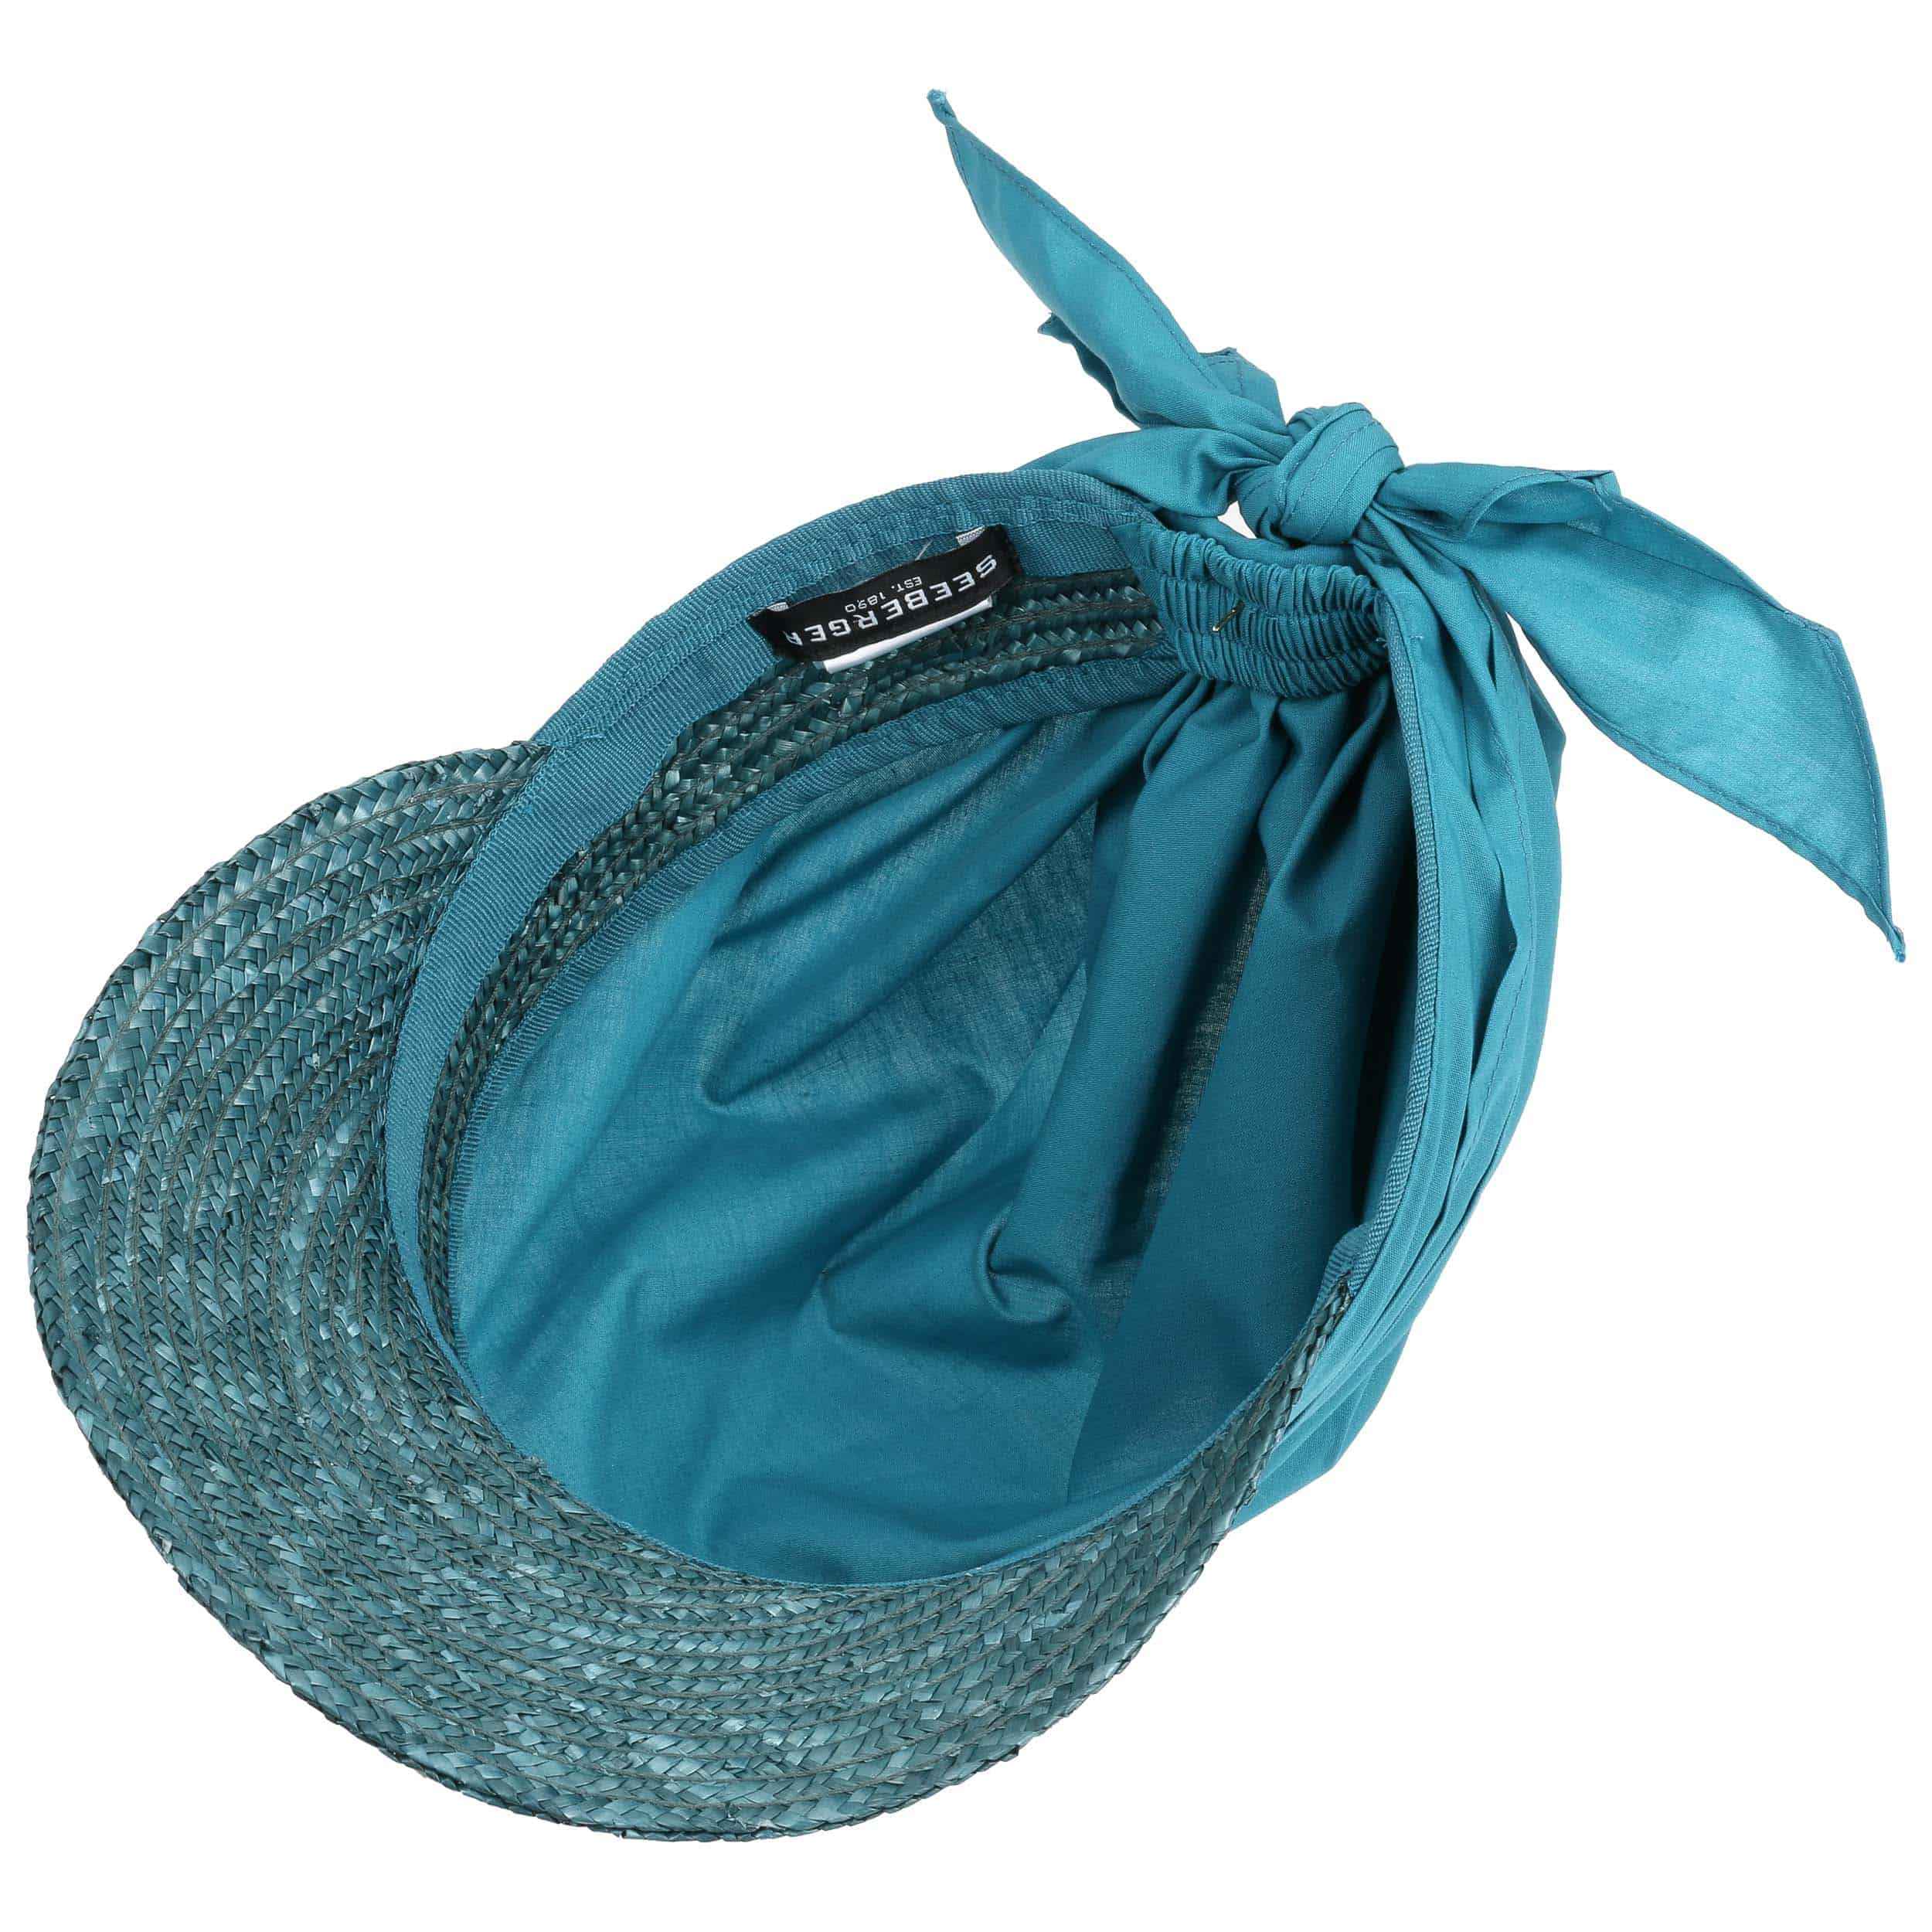 Gorra con Visera Paja Ansali by Seeberger - Bandanas - sombreroshop.es 5085b928538